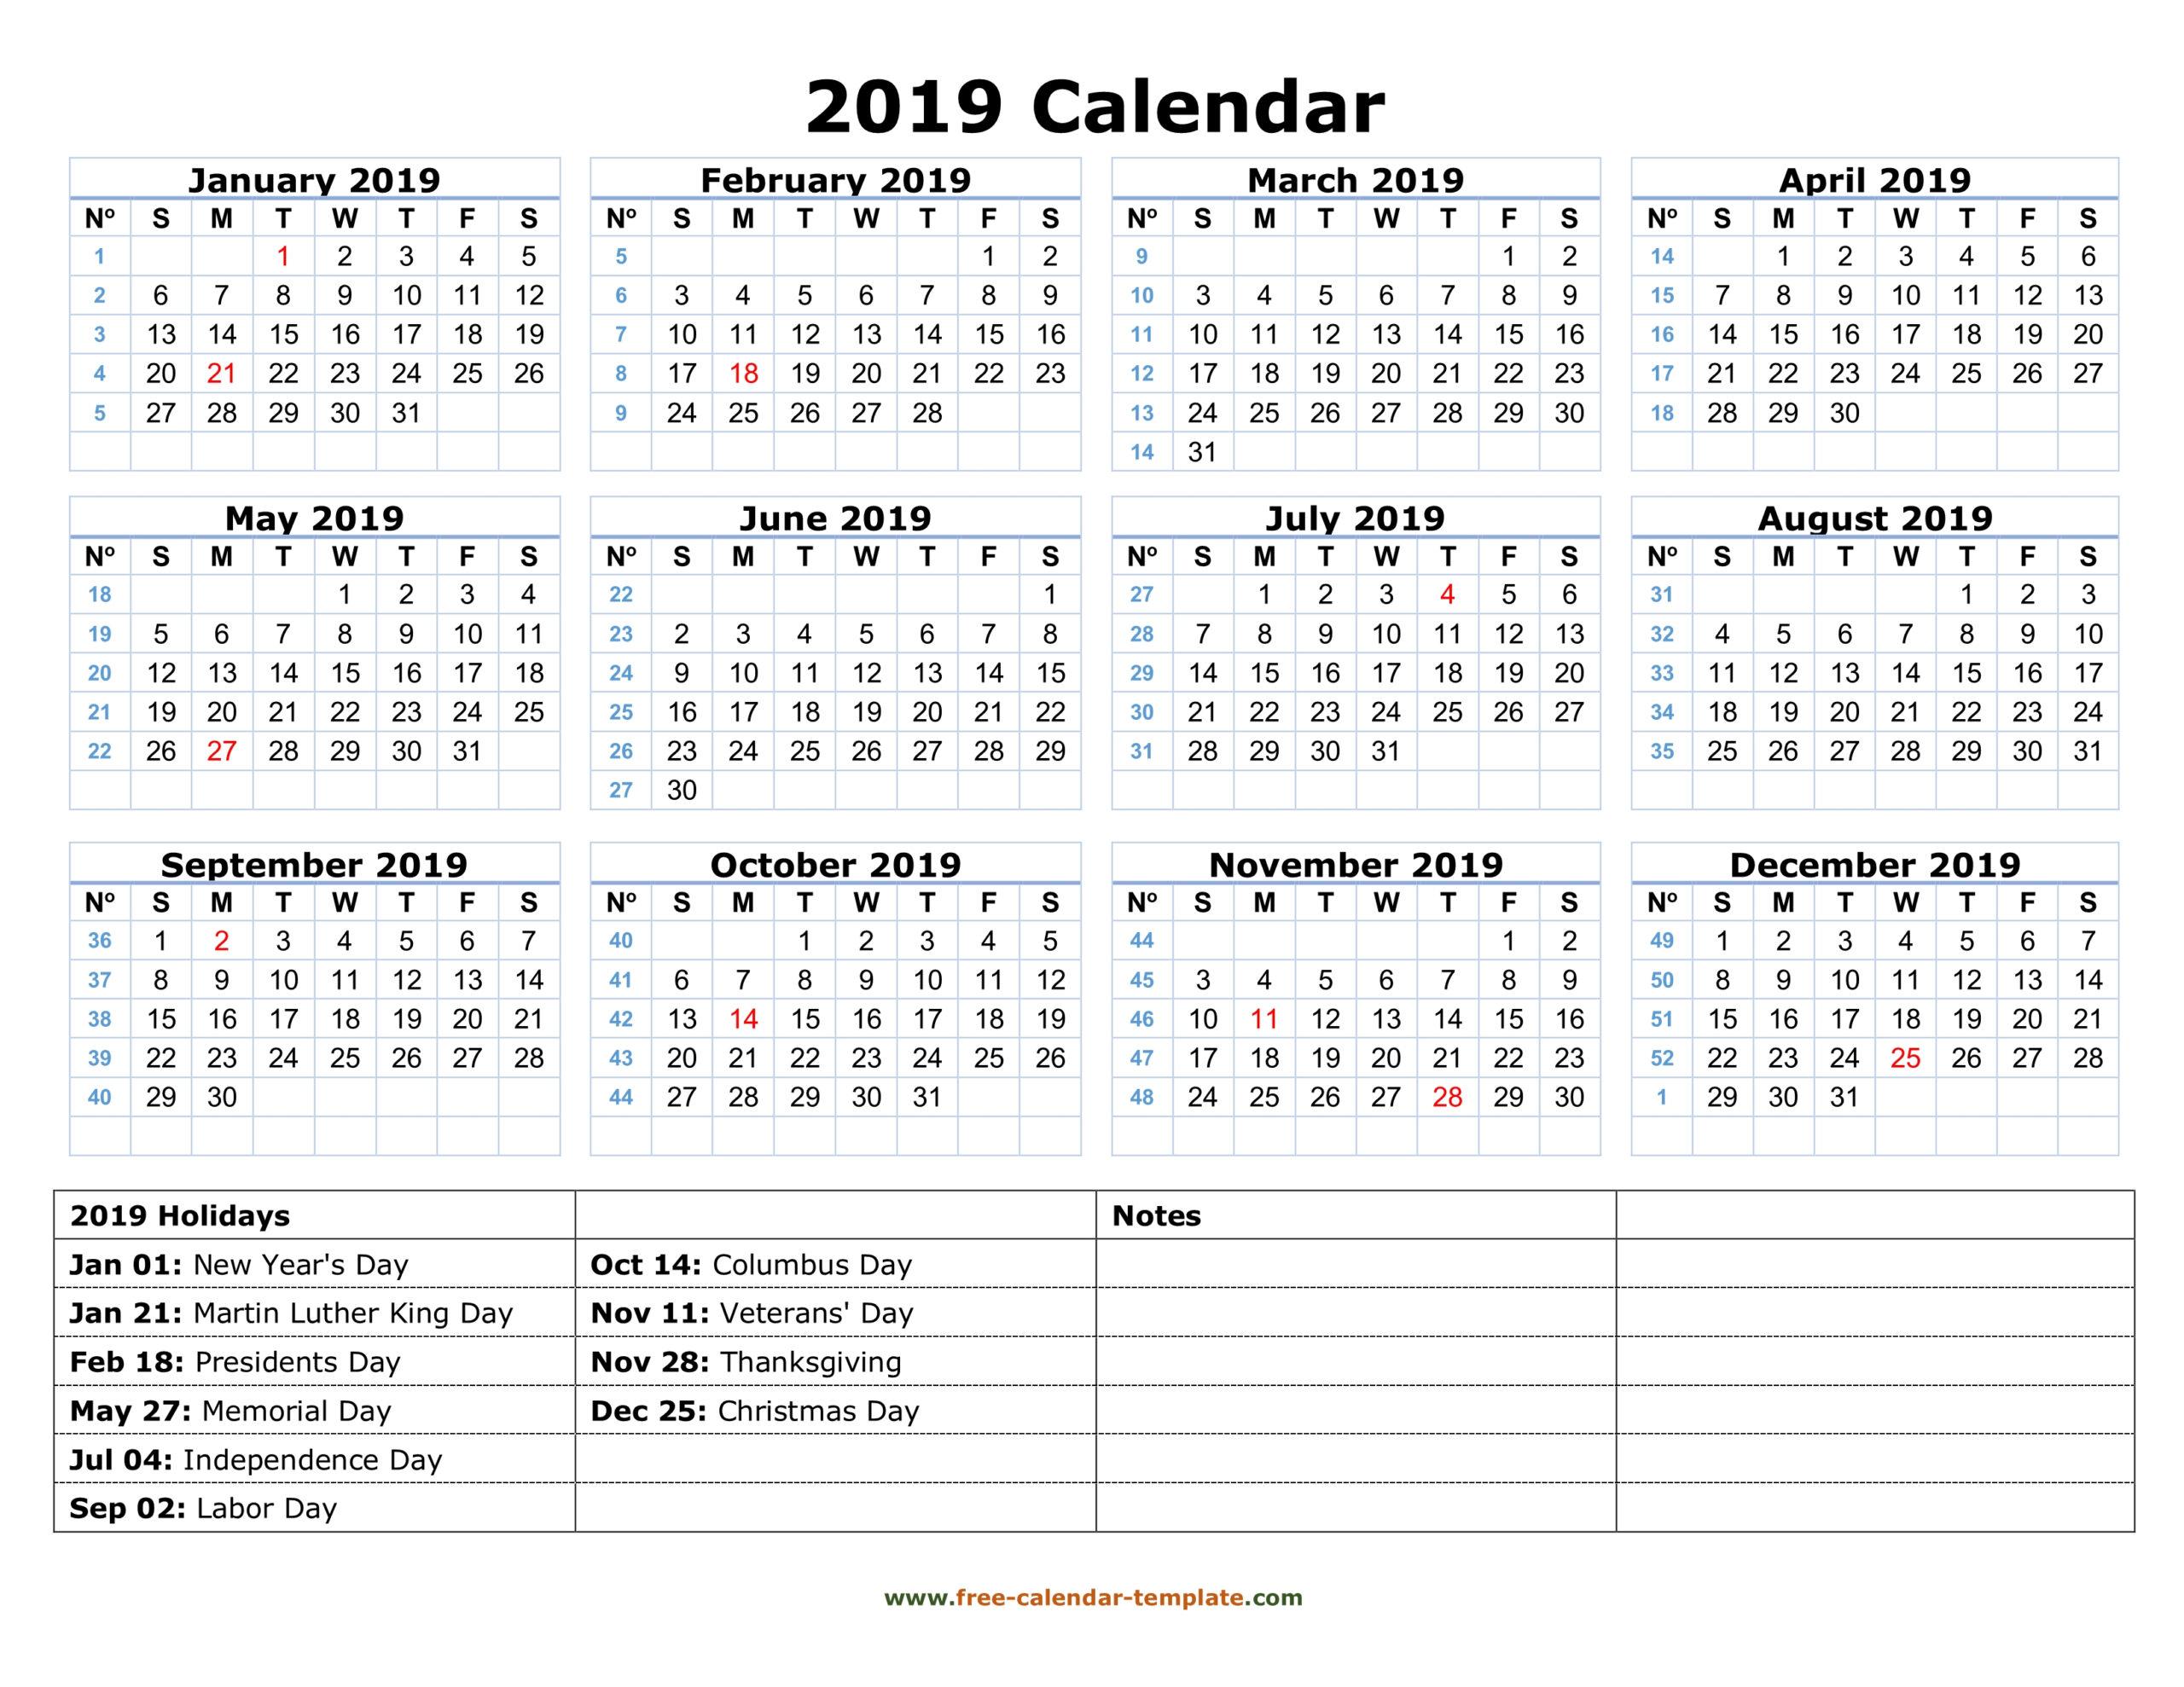 Printable Yearly Calendar 2019 | Free-Calendar-Template